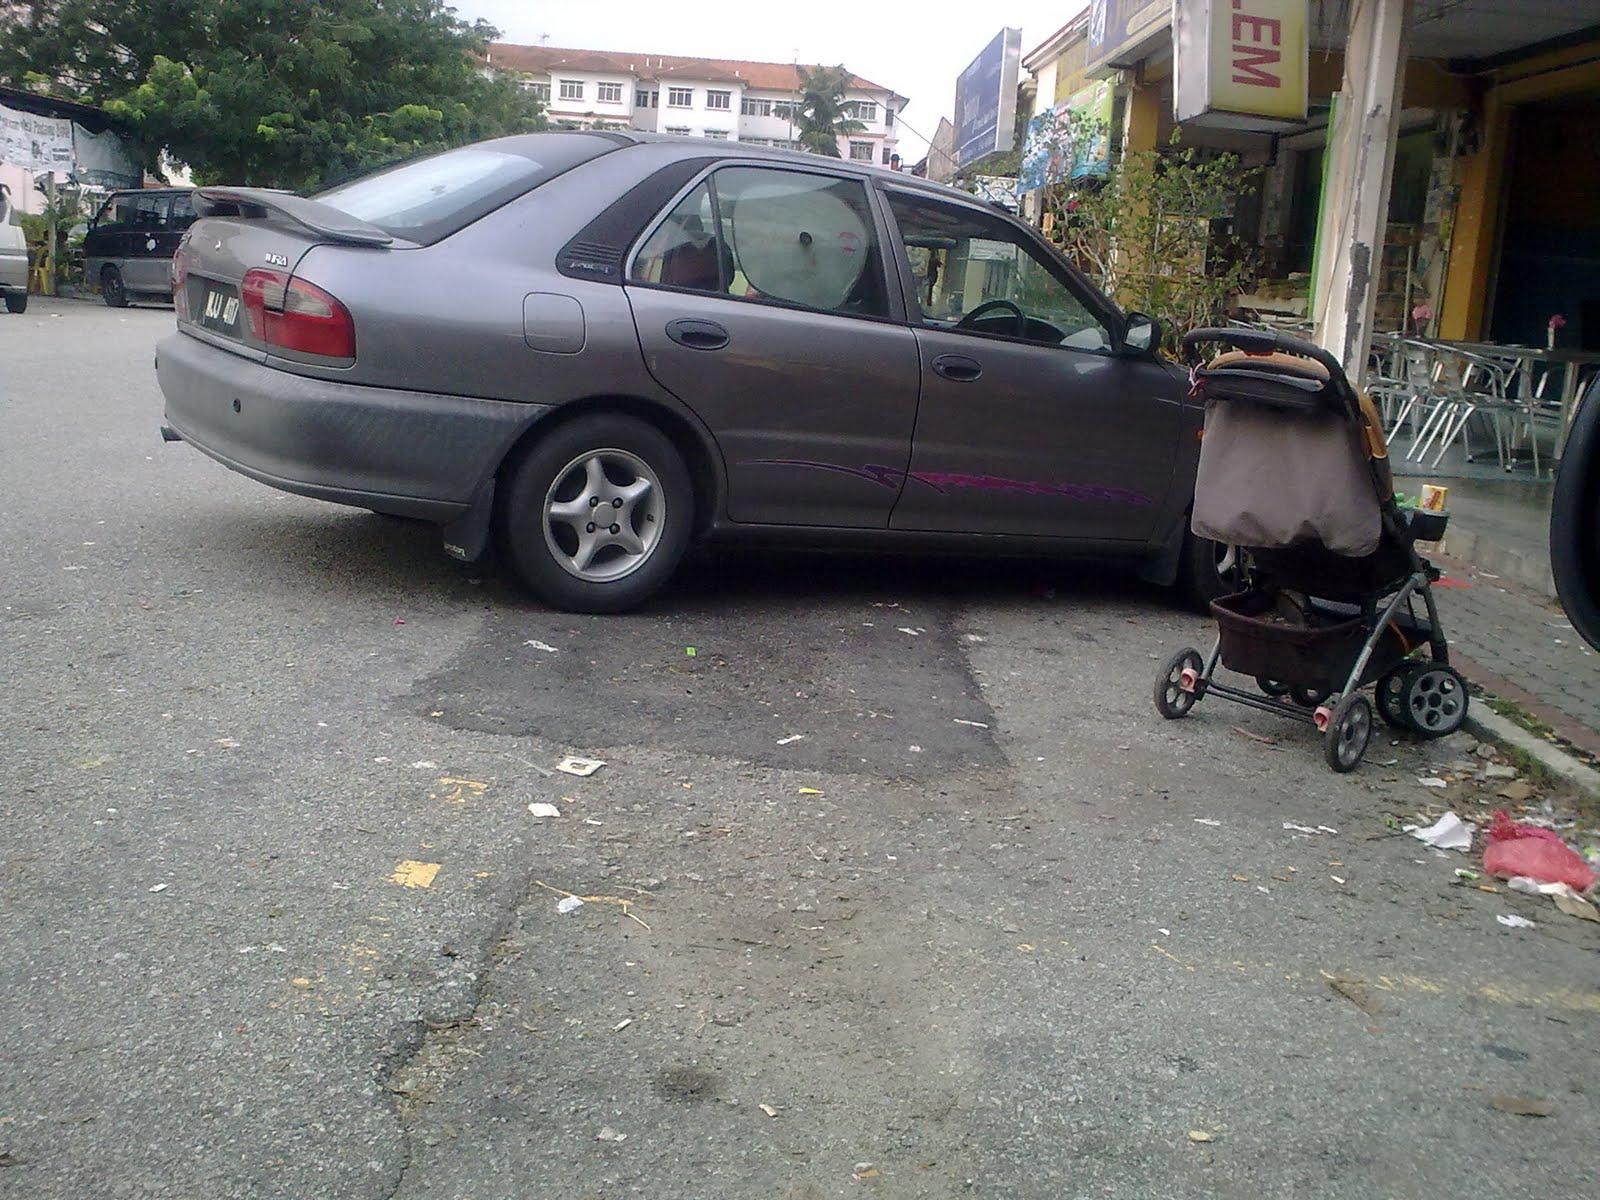 Patutlah lot parking penuh!